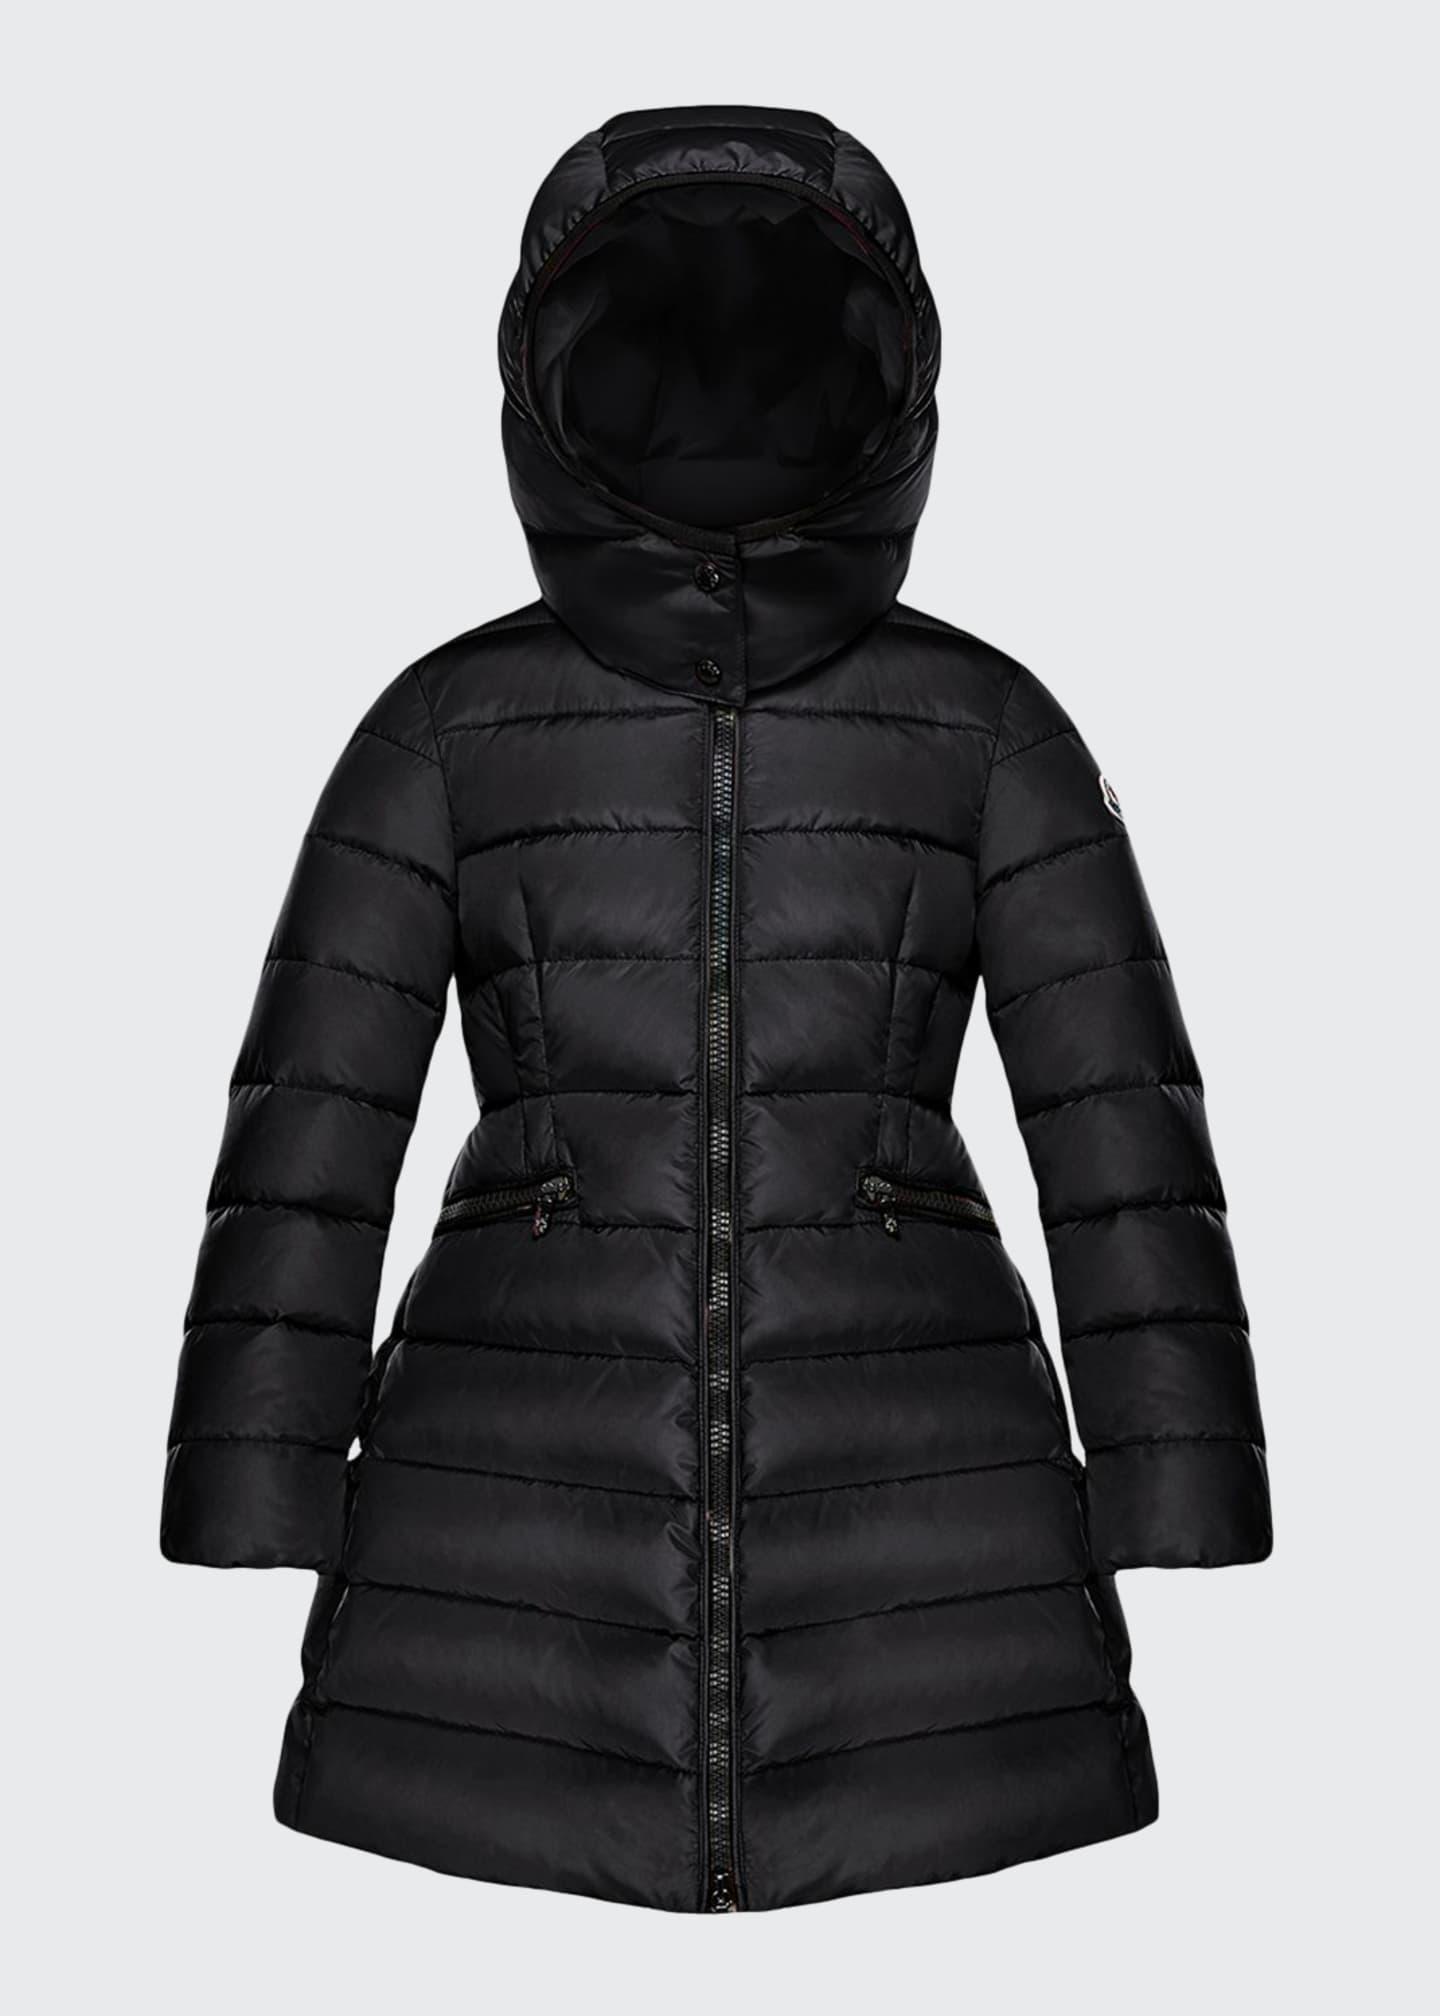 Moncler Charpal Detachable-Hood Puffer Coat, Size 4-6